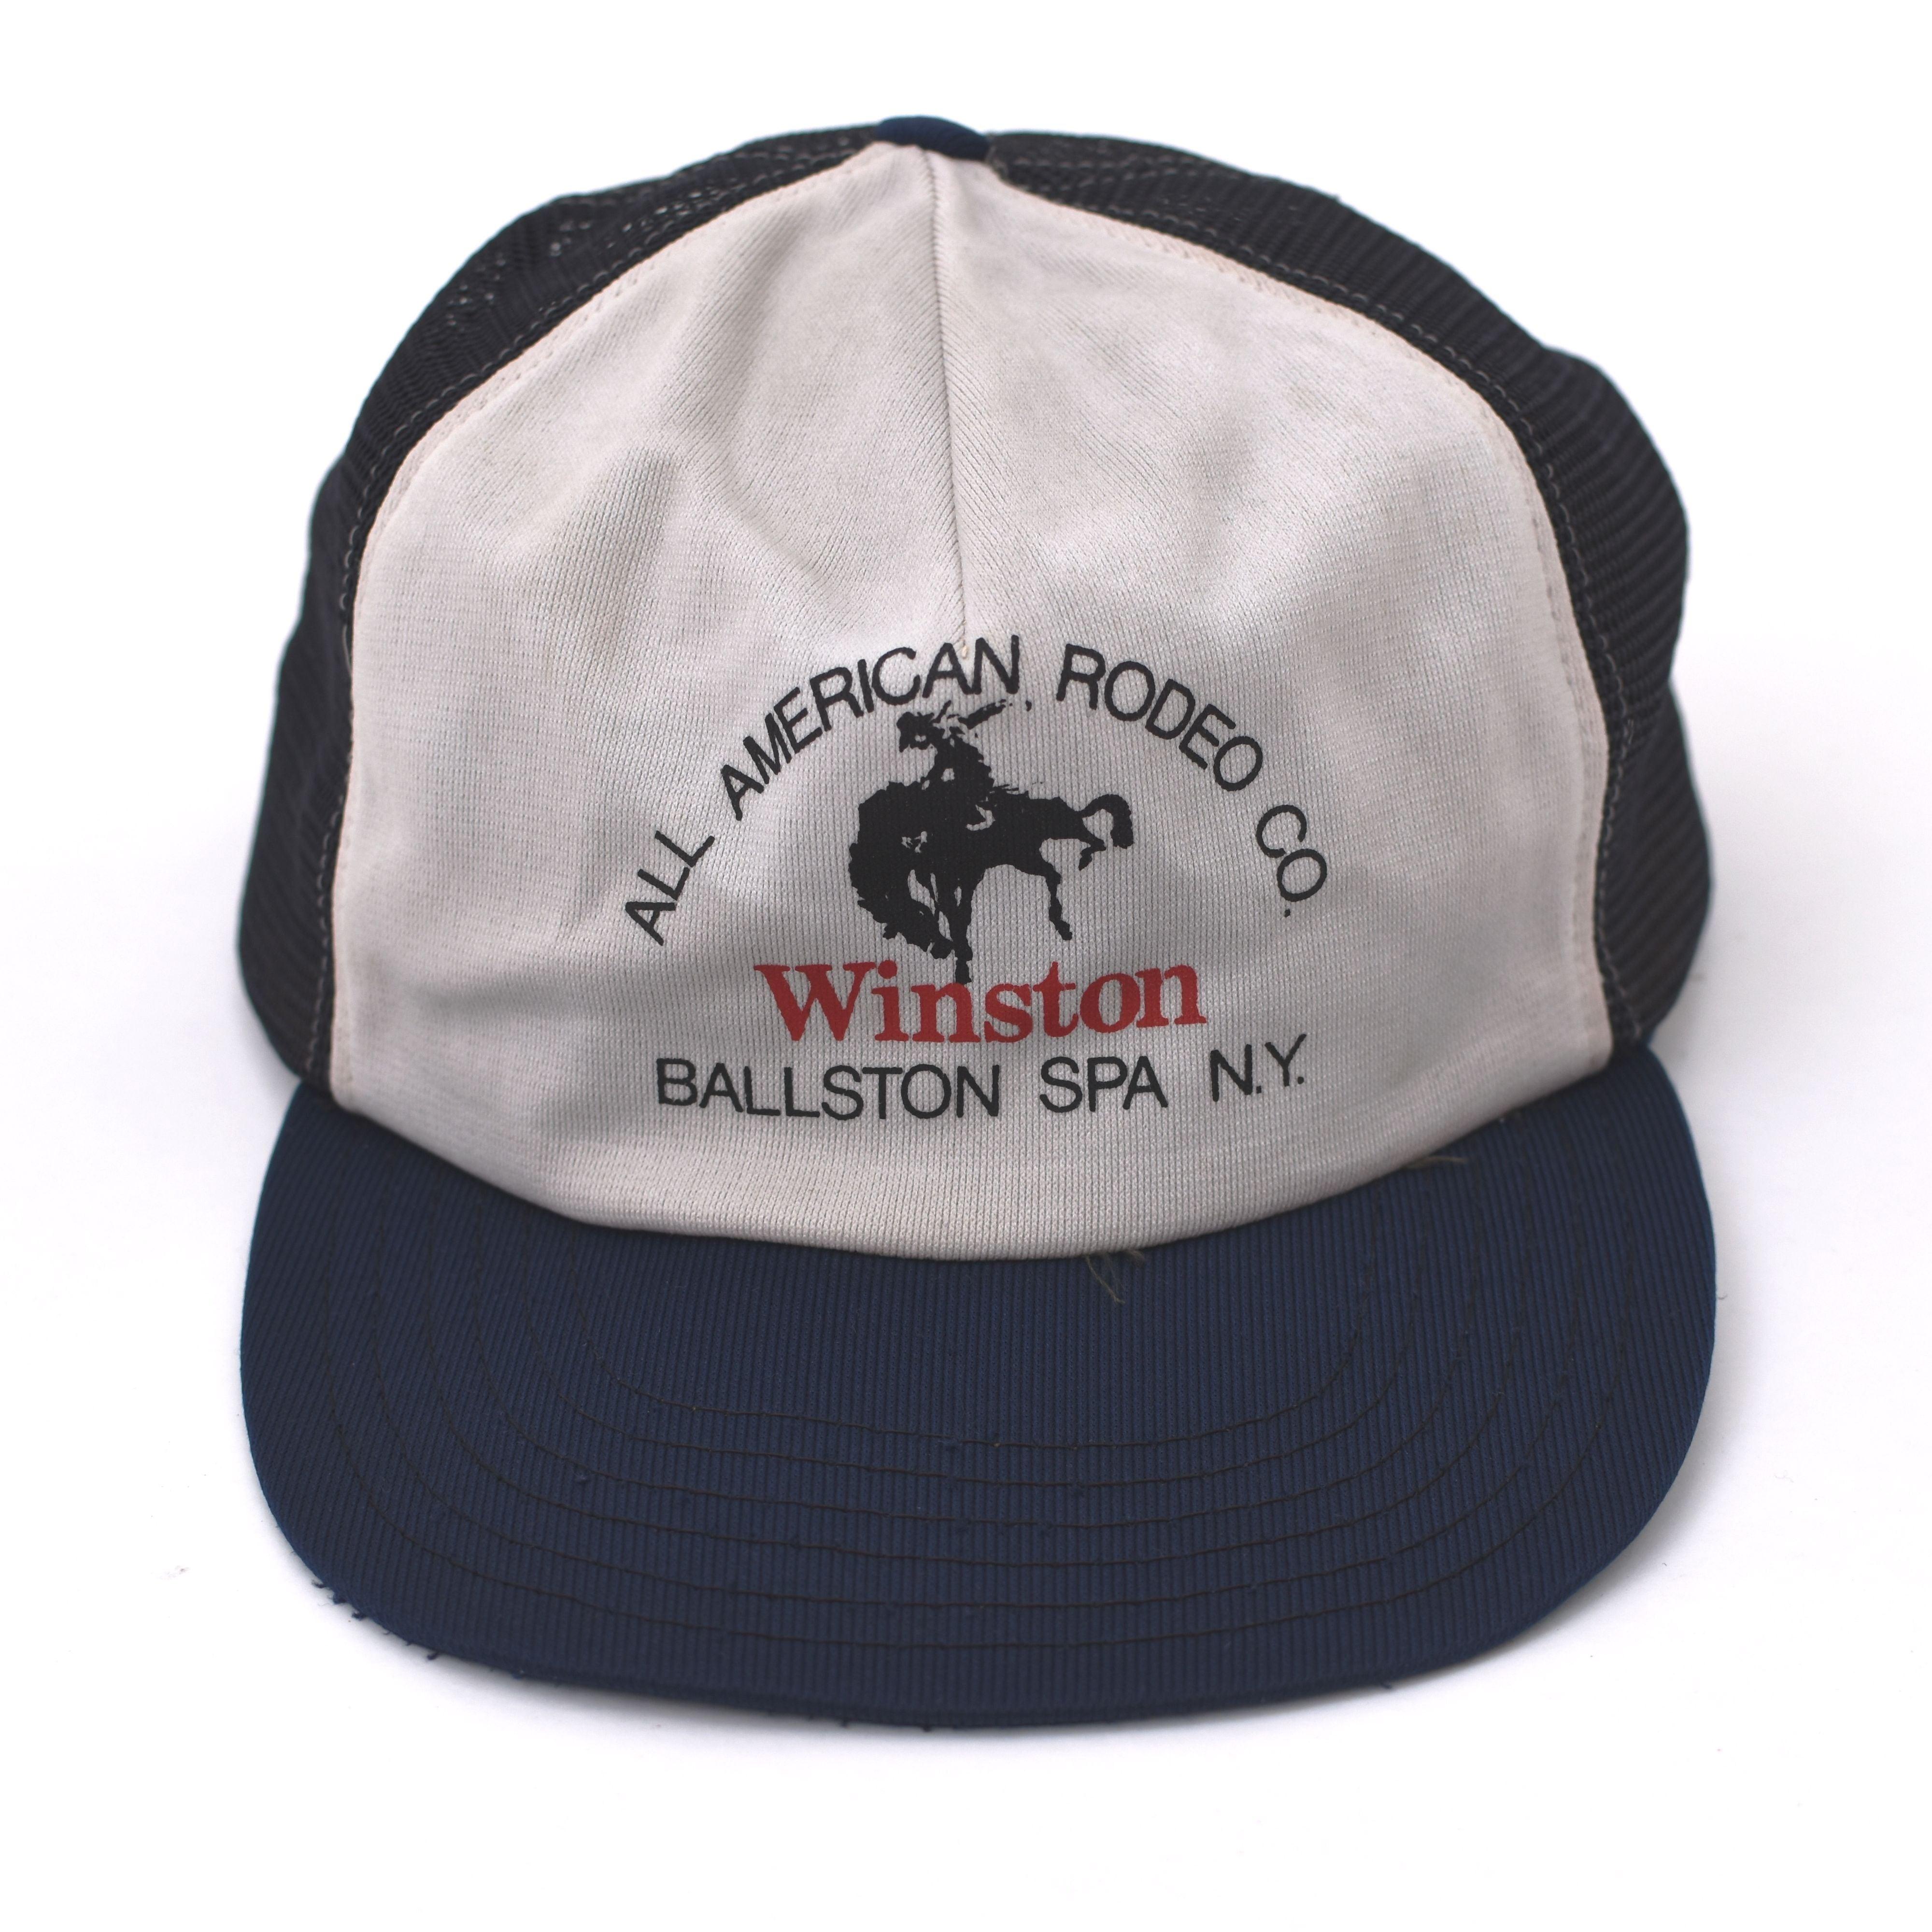 USA Made Winston official baseball cap ヴィンテージ メッシュキャップ